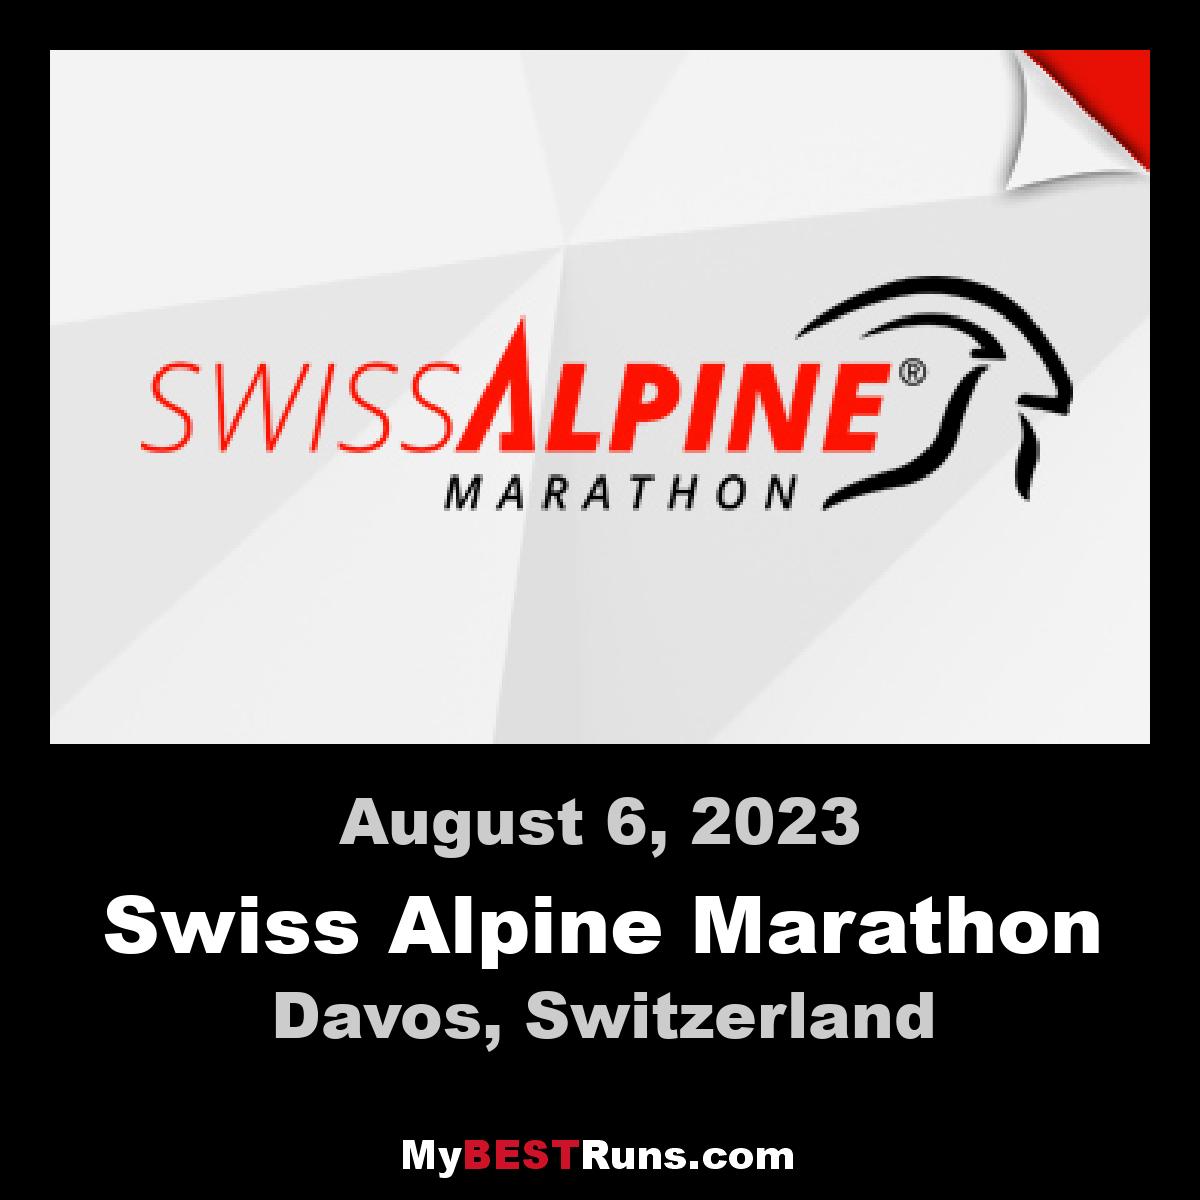 Swiss Alpine Marathon